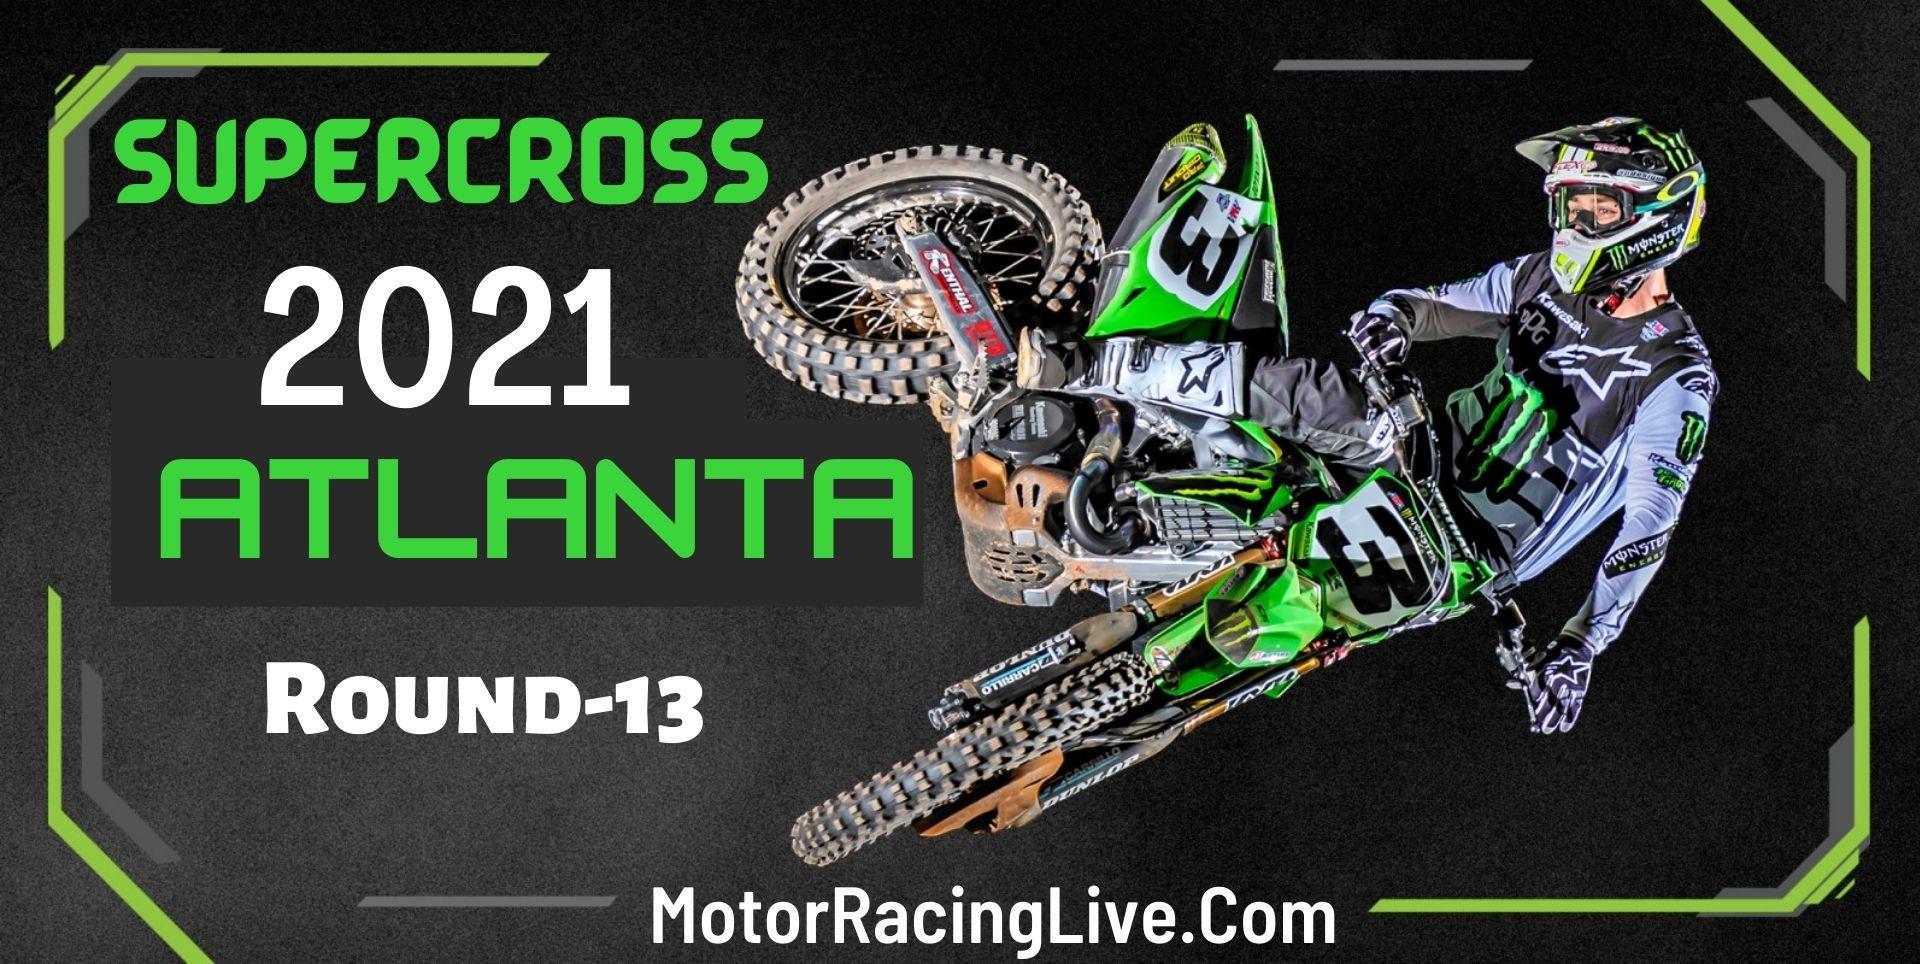 Supercross Atlanta Rd 13 Live 10-Apr 2021